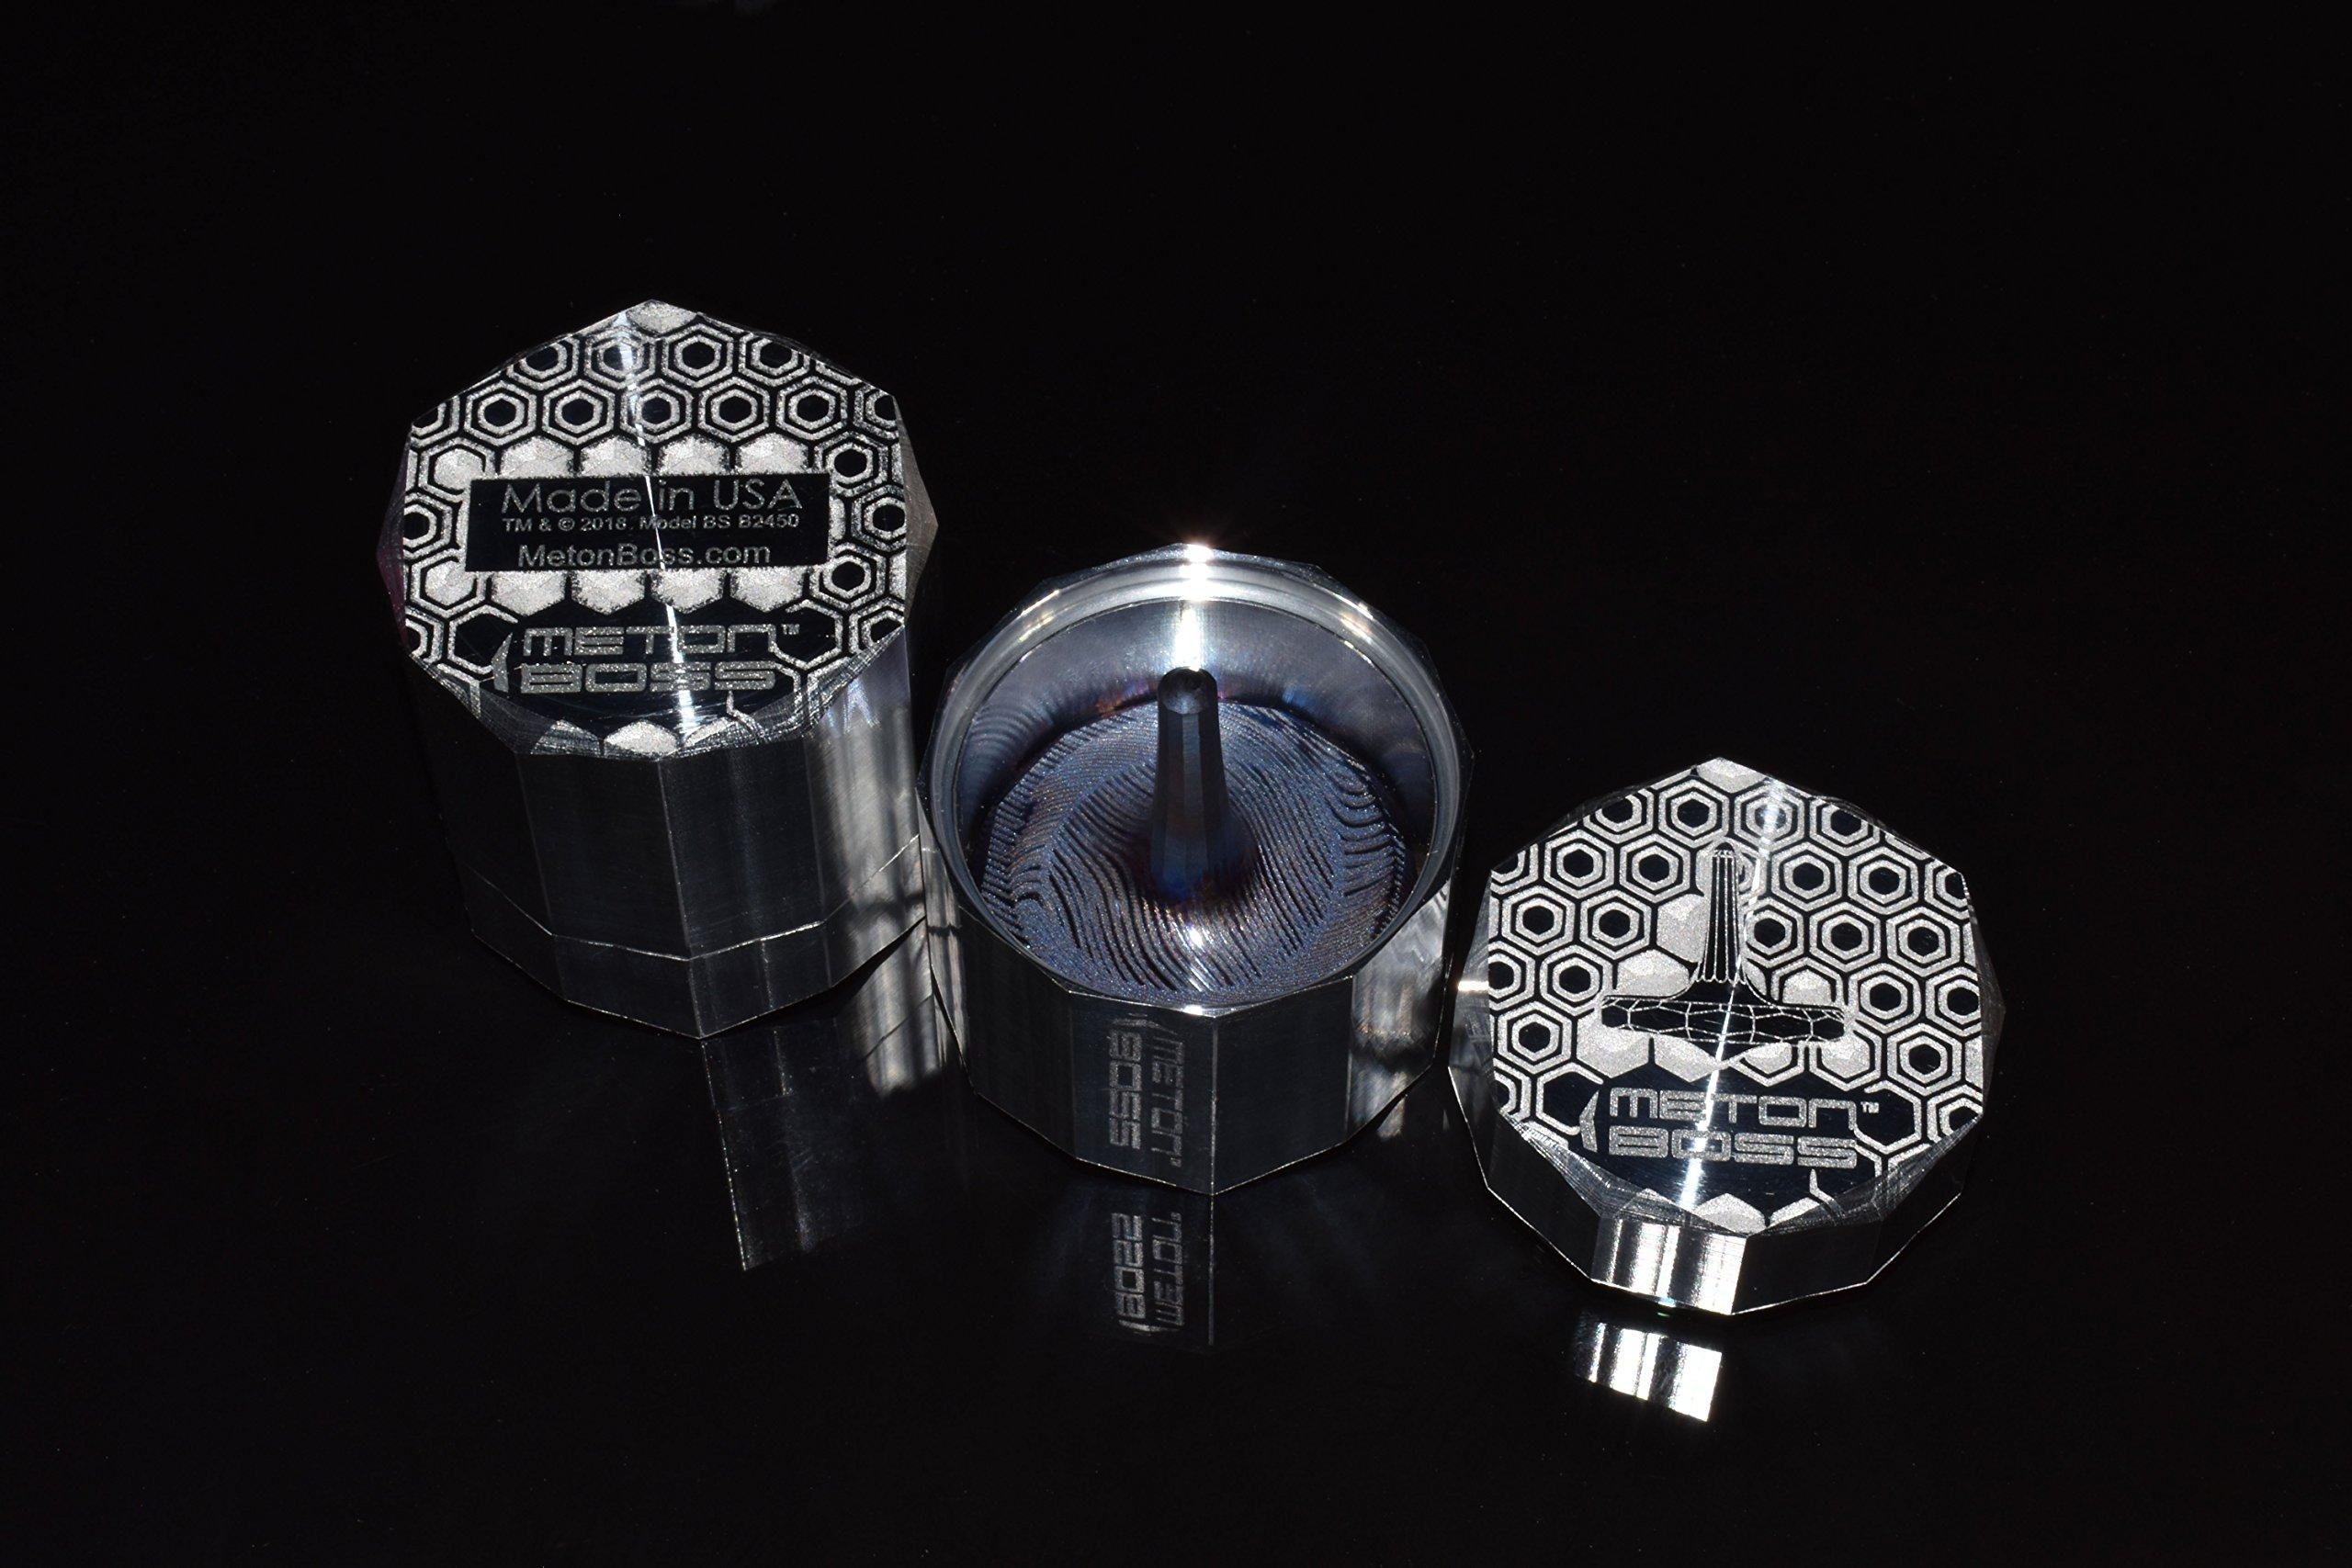 MetonBoss Damascus Wave Titanium Spinning Top - Aerospace Grade 5 Titanium (Heat Colored Purple) by MetonBoss (Image #6)